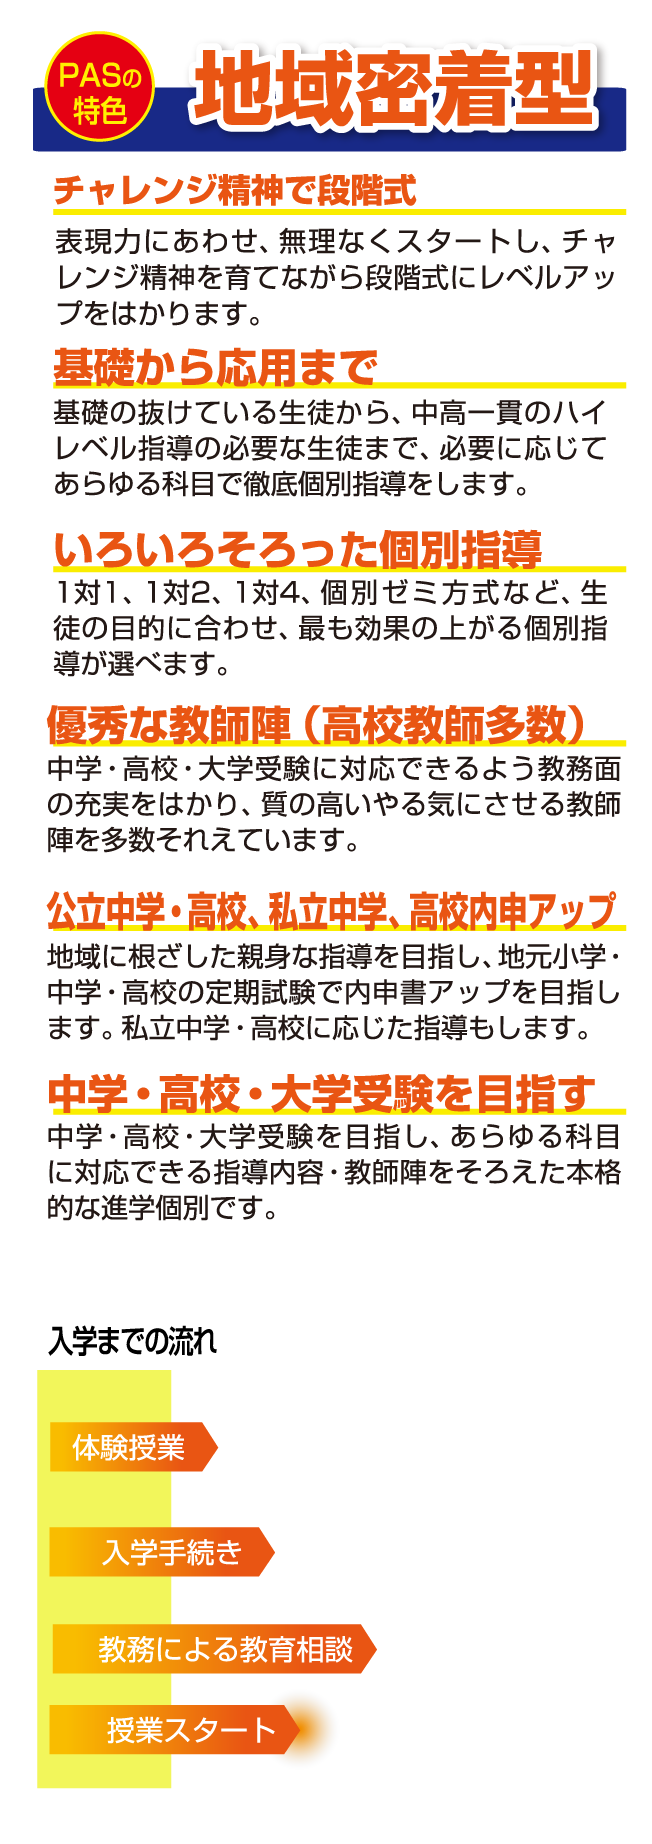 tokusyokum